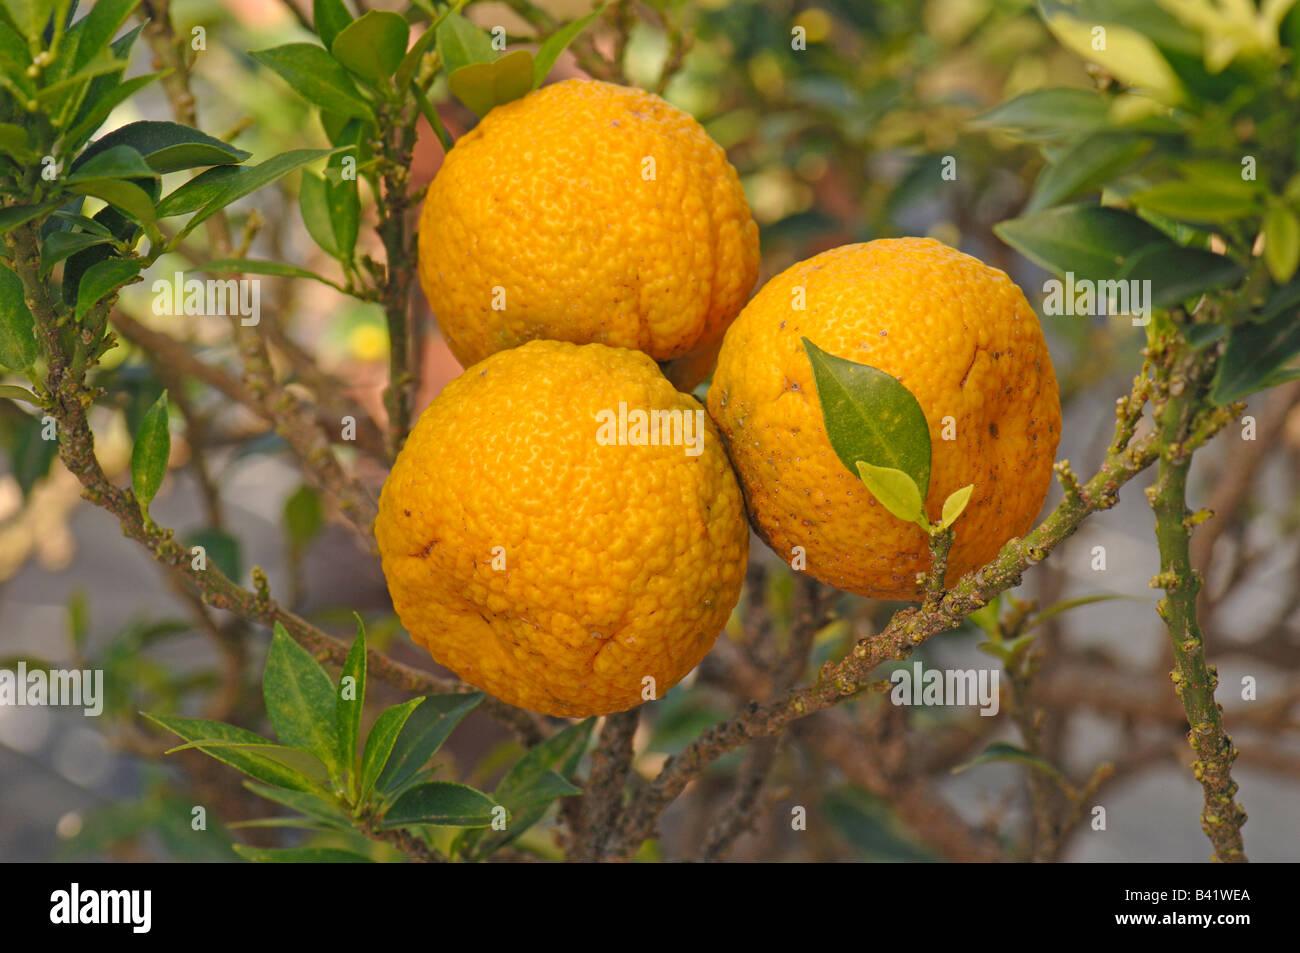 Chinotto myrtle leaved orange tree citrus myrtifolia for Citrus myrtifolia